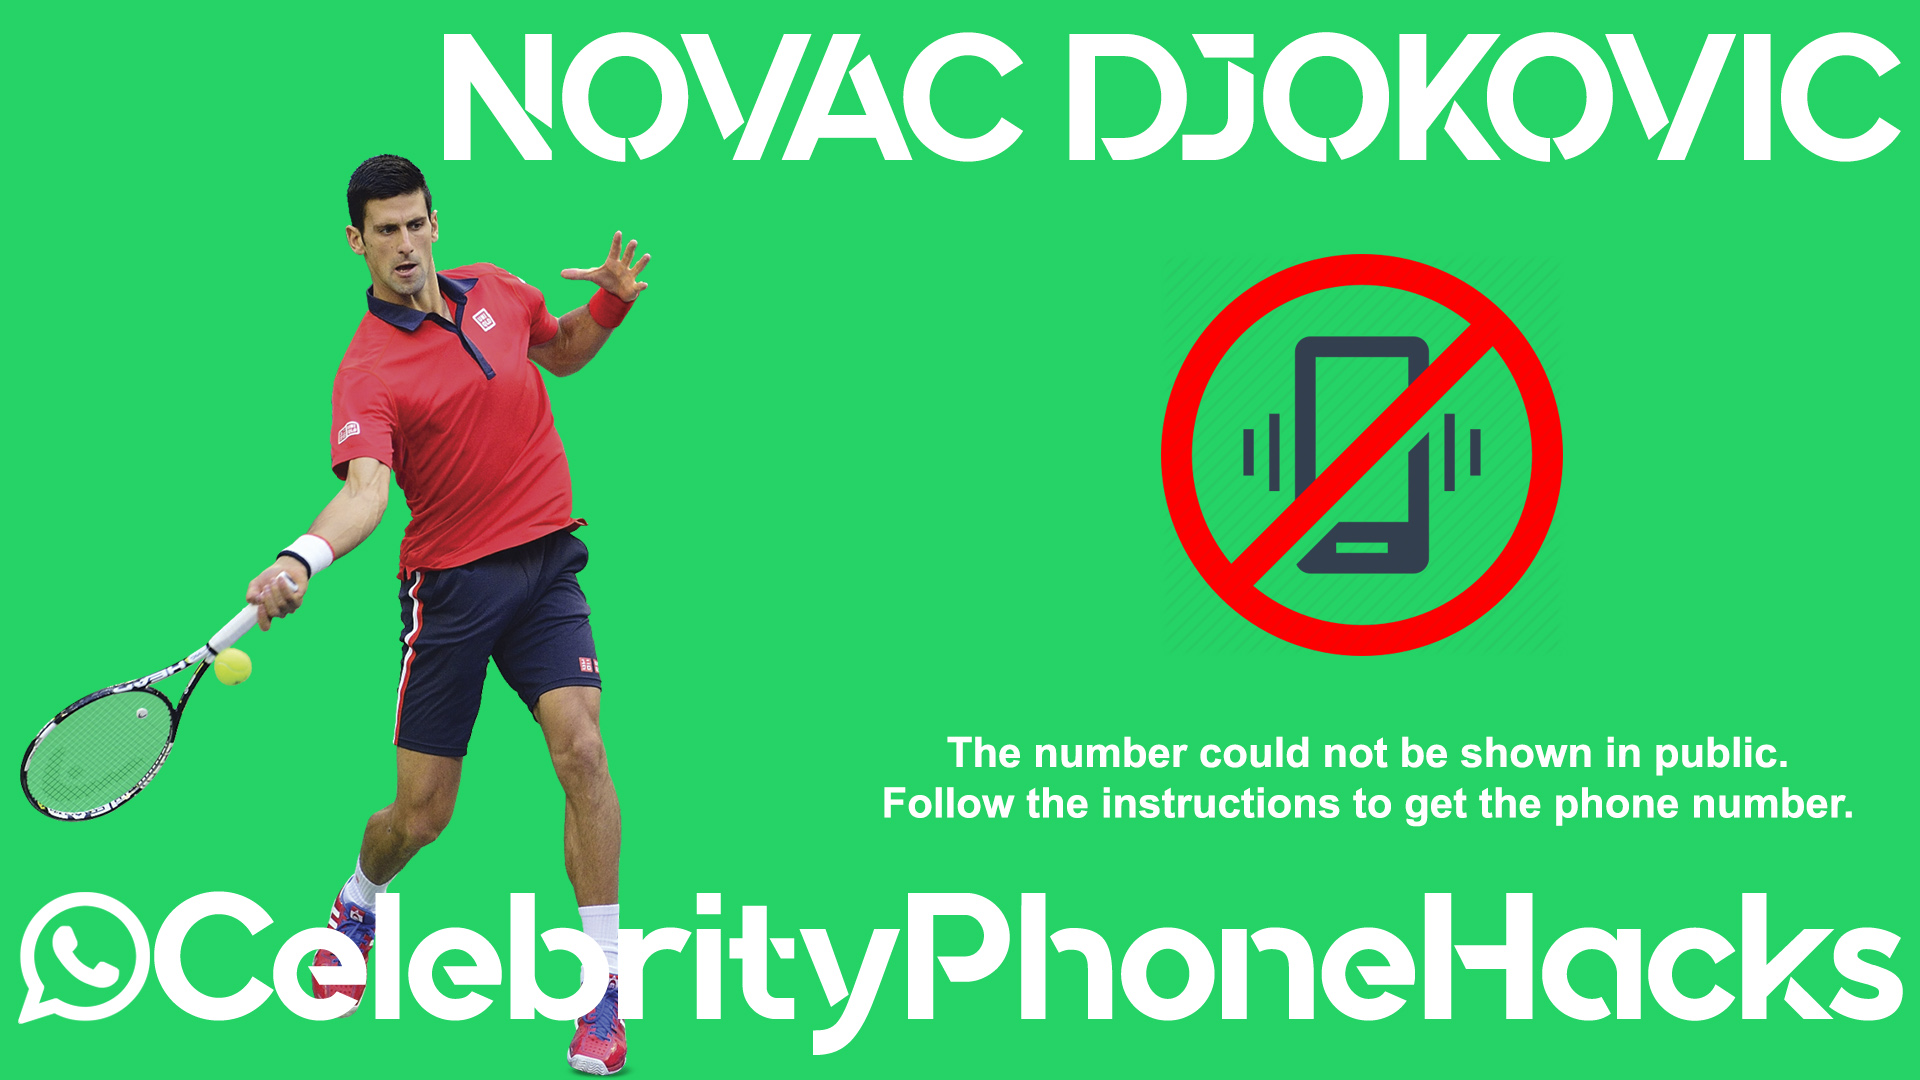 Novac Djokovic real phone number 2019 whatsapp hacked leaked